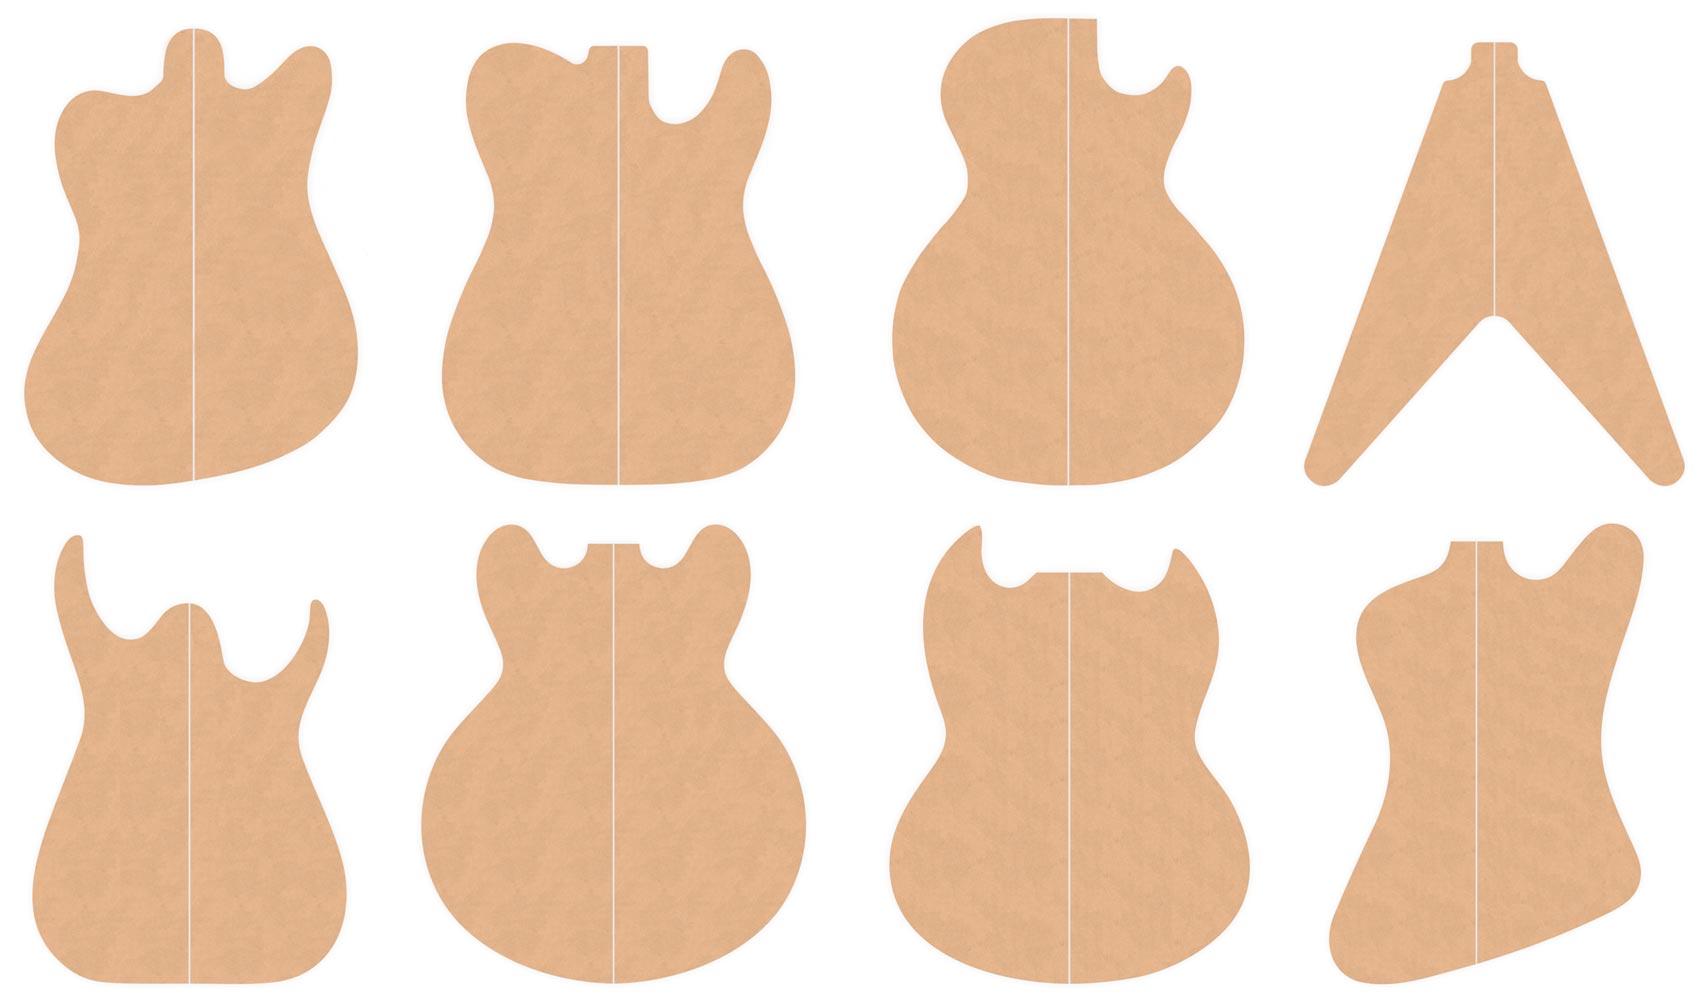 Guitar Body Templates | Guitar Body Templates Electric Herald